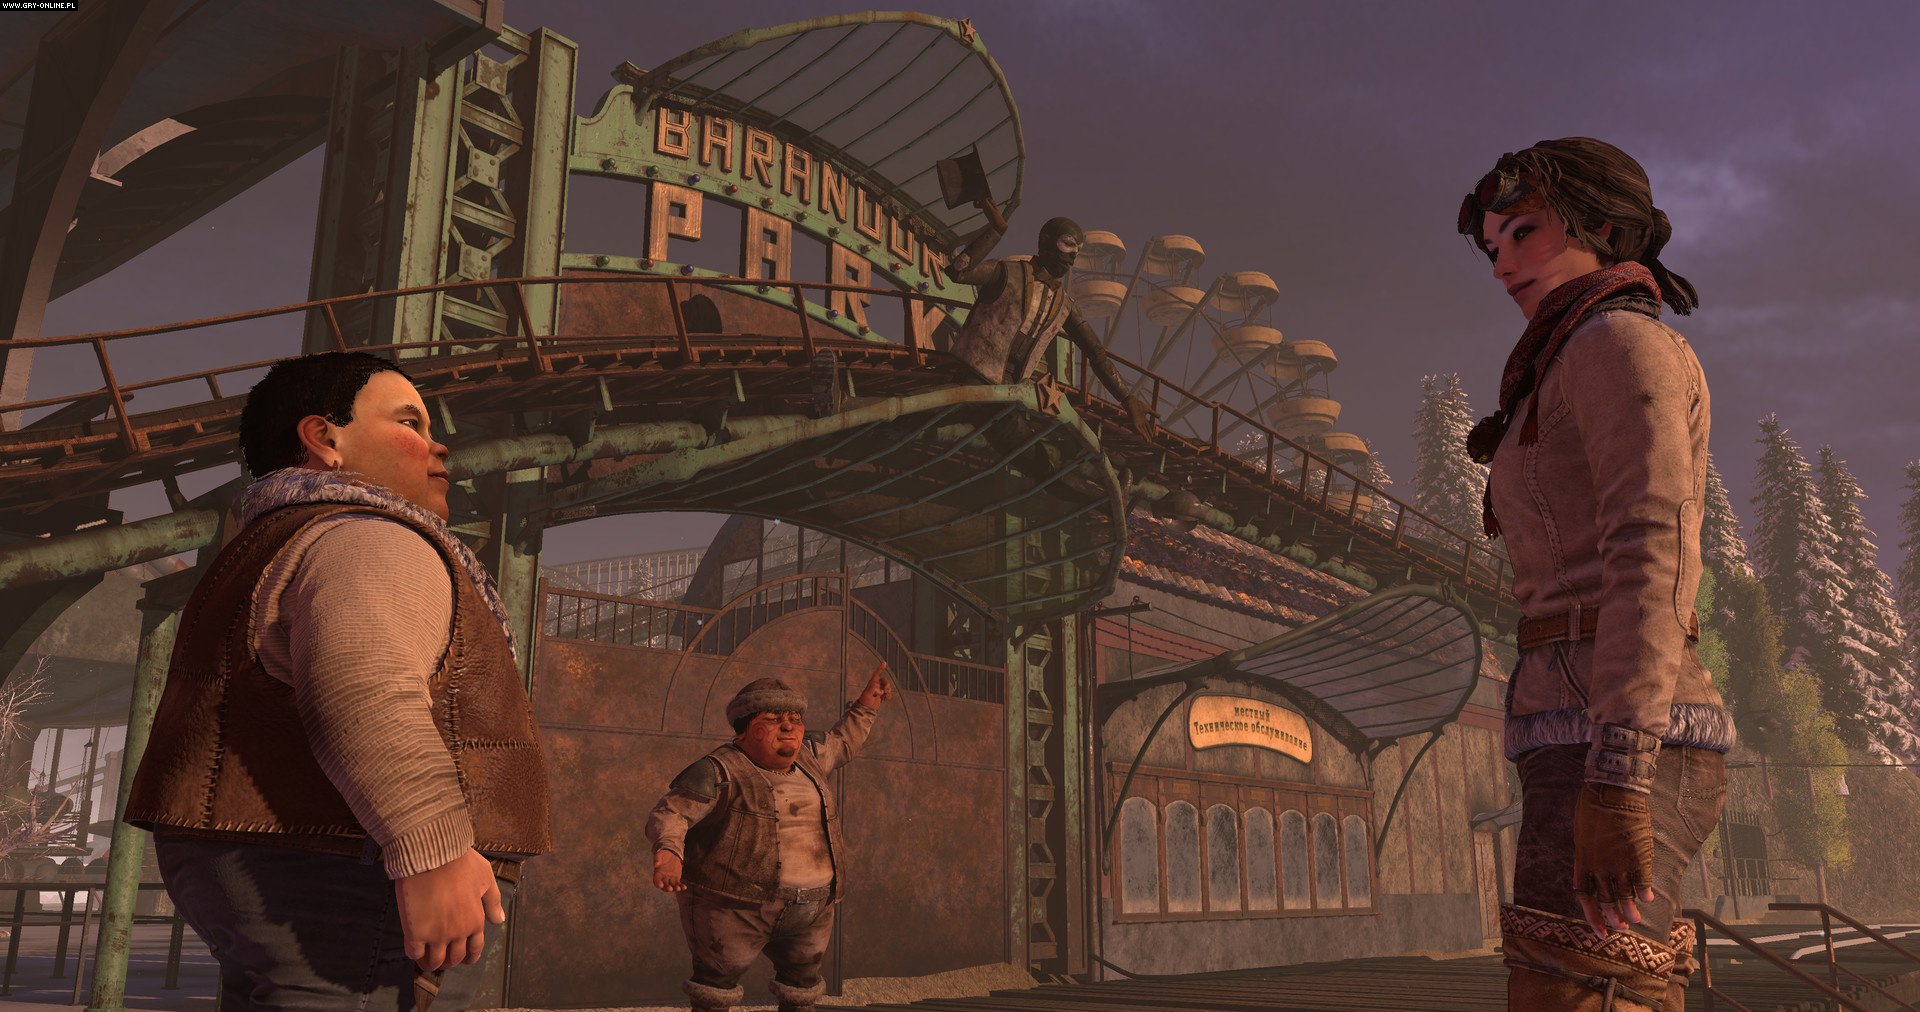 Syberia 3 PC, PS4, XONE Games Image 7/30, Microids/Anuman Interactive